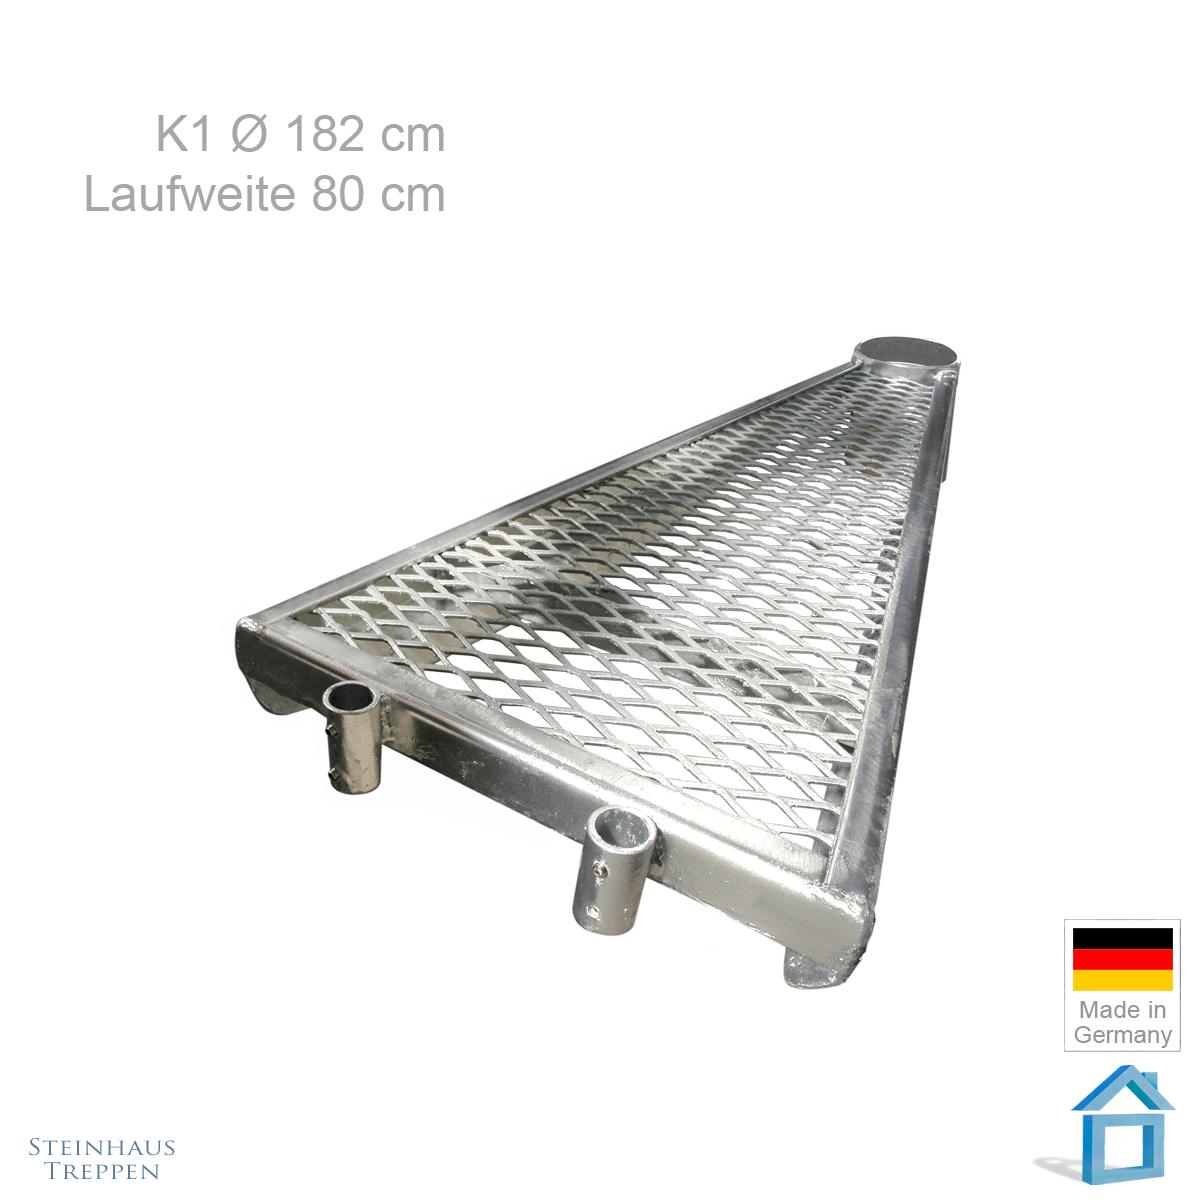 Zusatzstufe Fur Au Entreppe K1 180 Cm